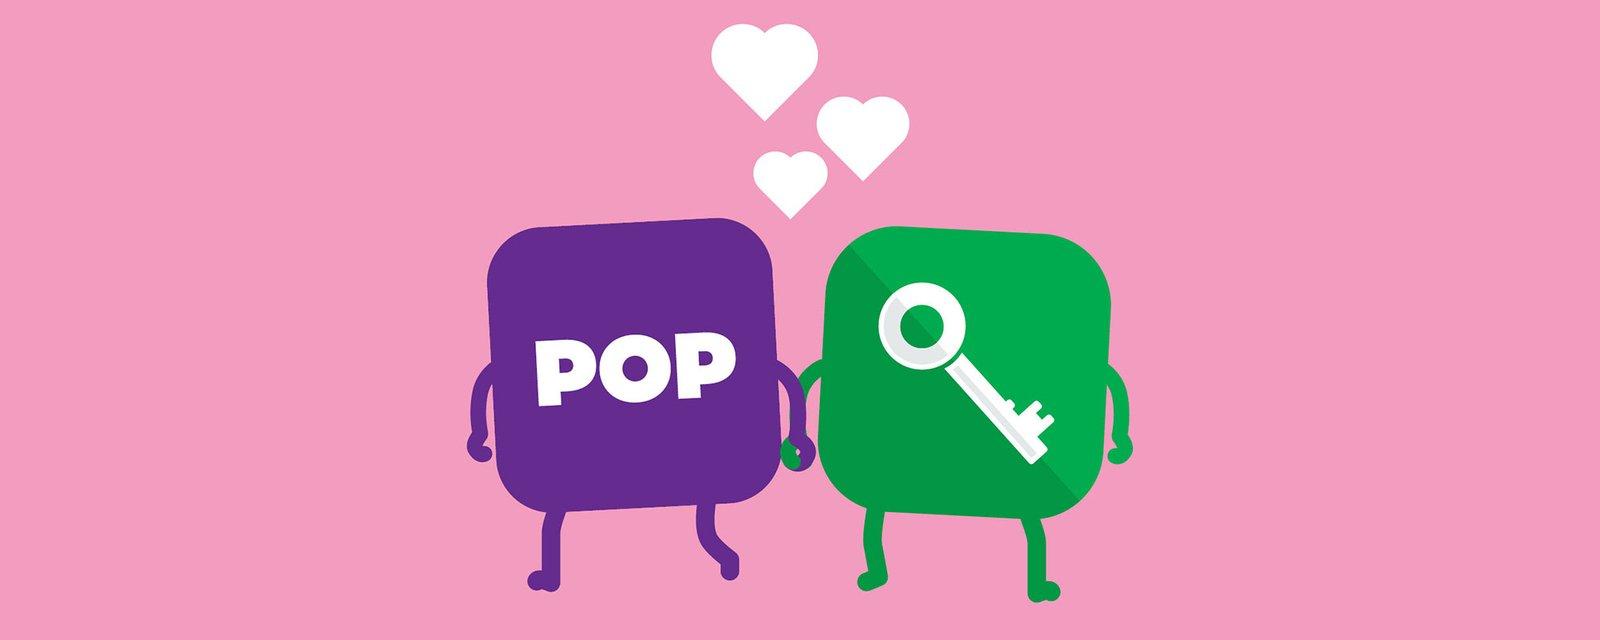 POP Mobiili ja POP Avain, kuvituskuva.